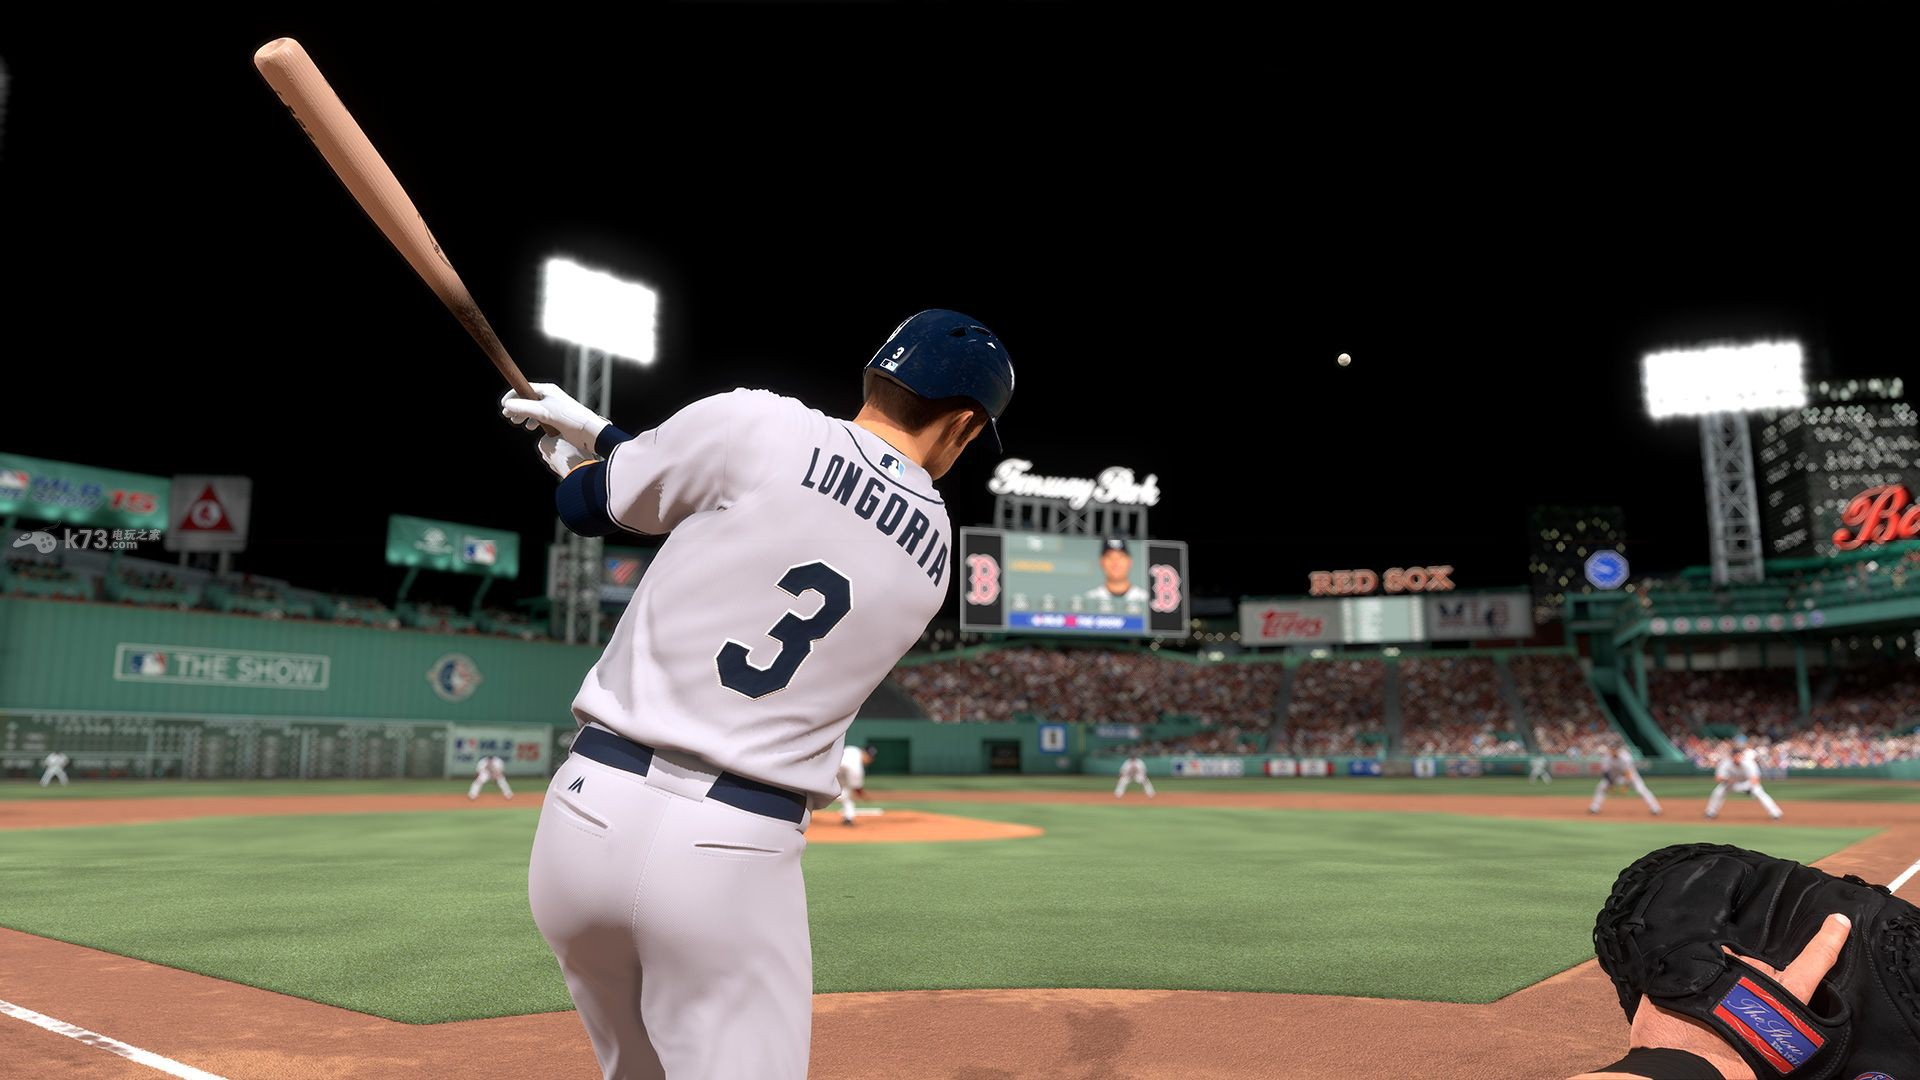 MLB美国职业棒球大联盟16 美版 截图